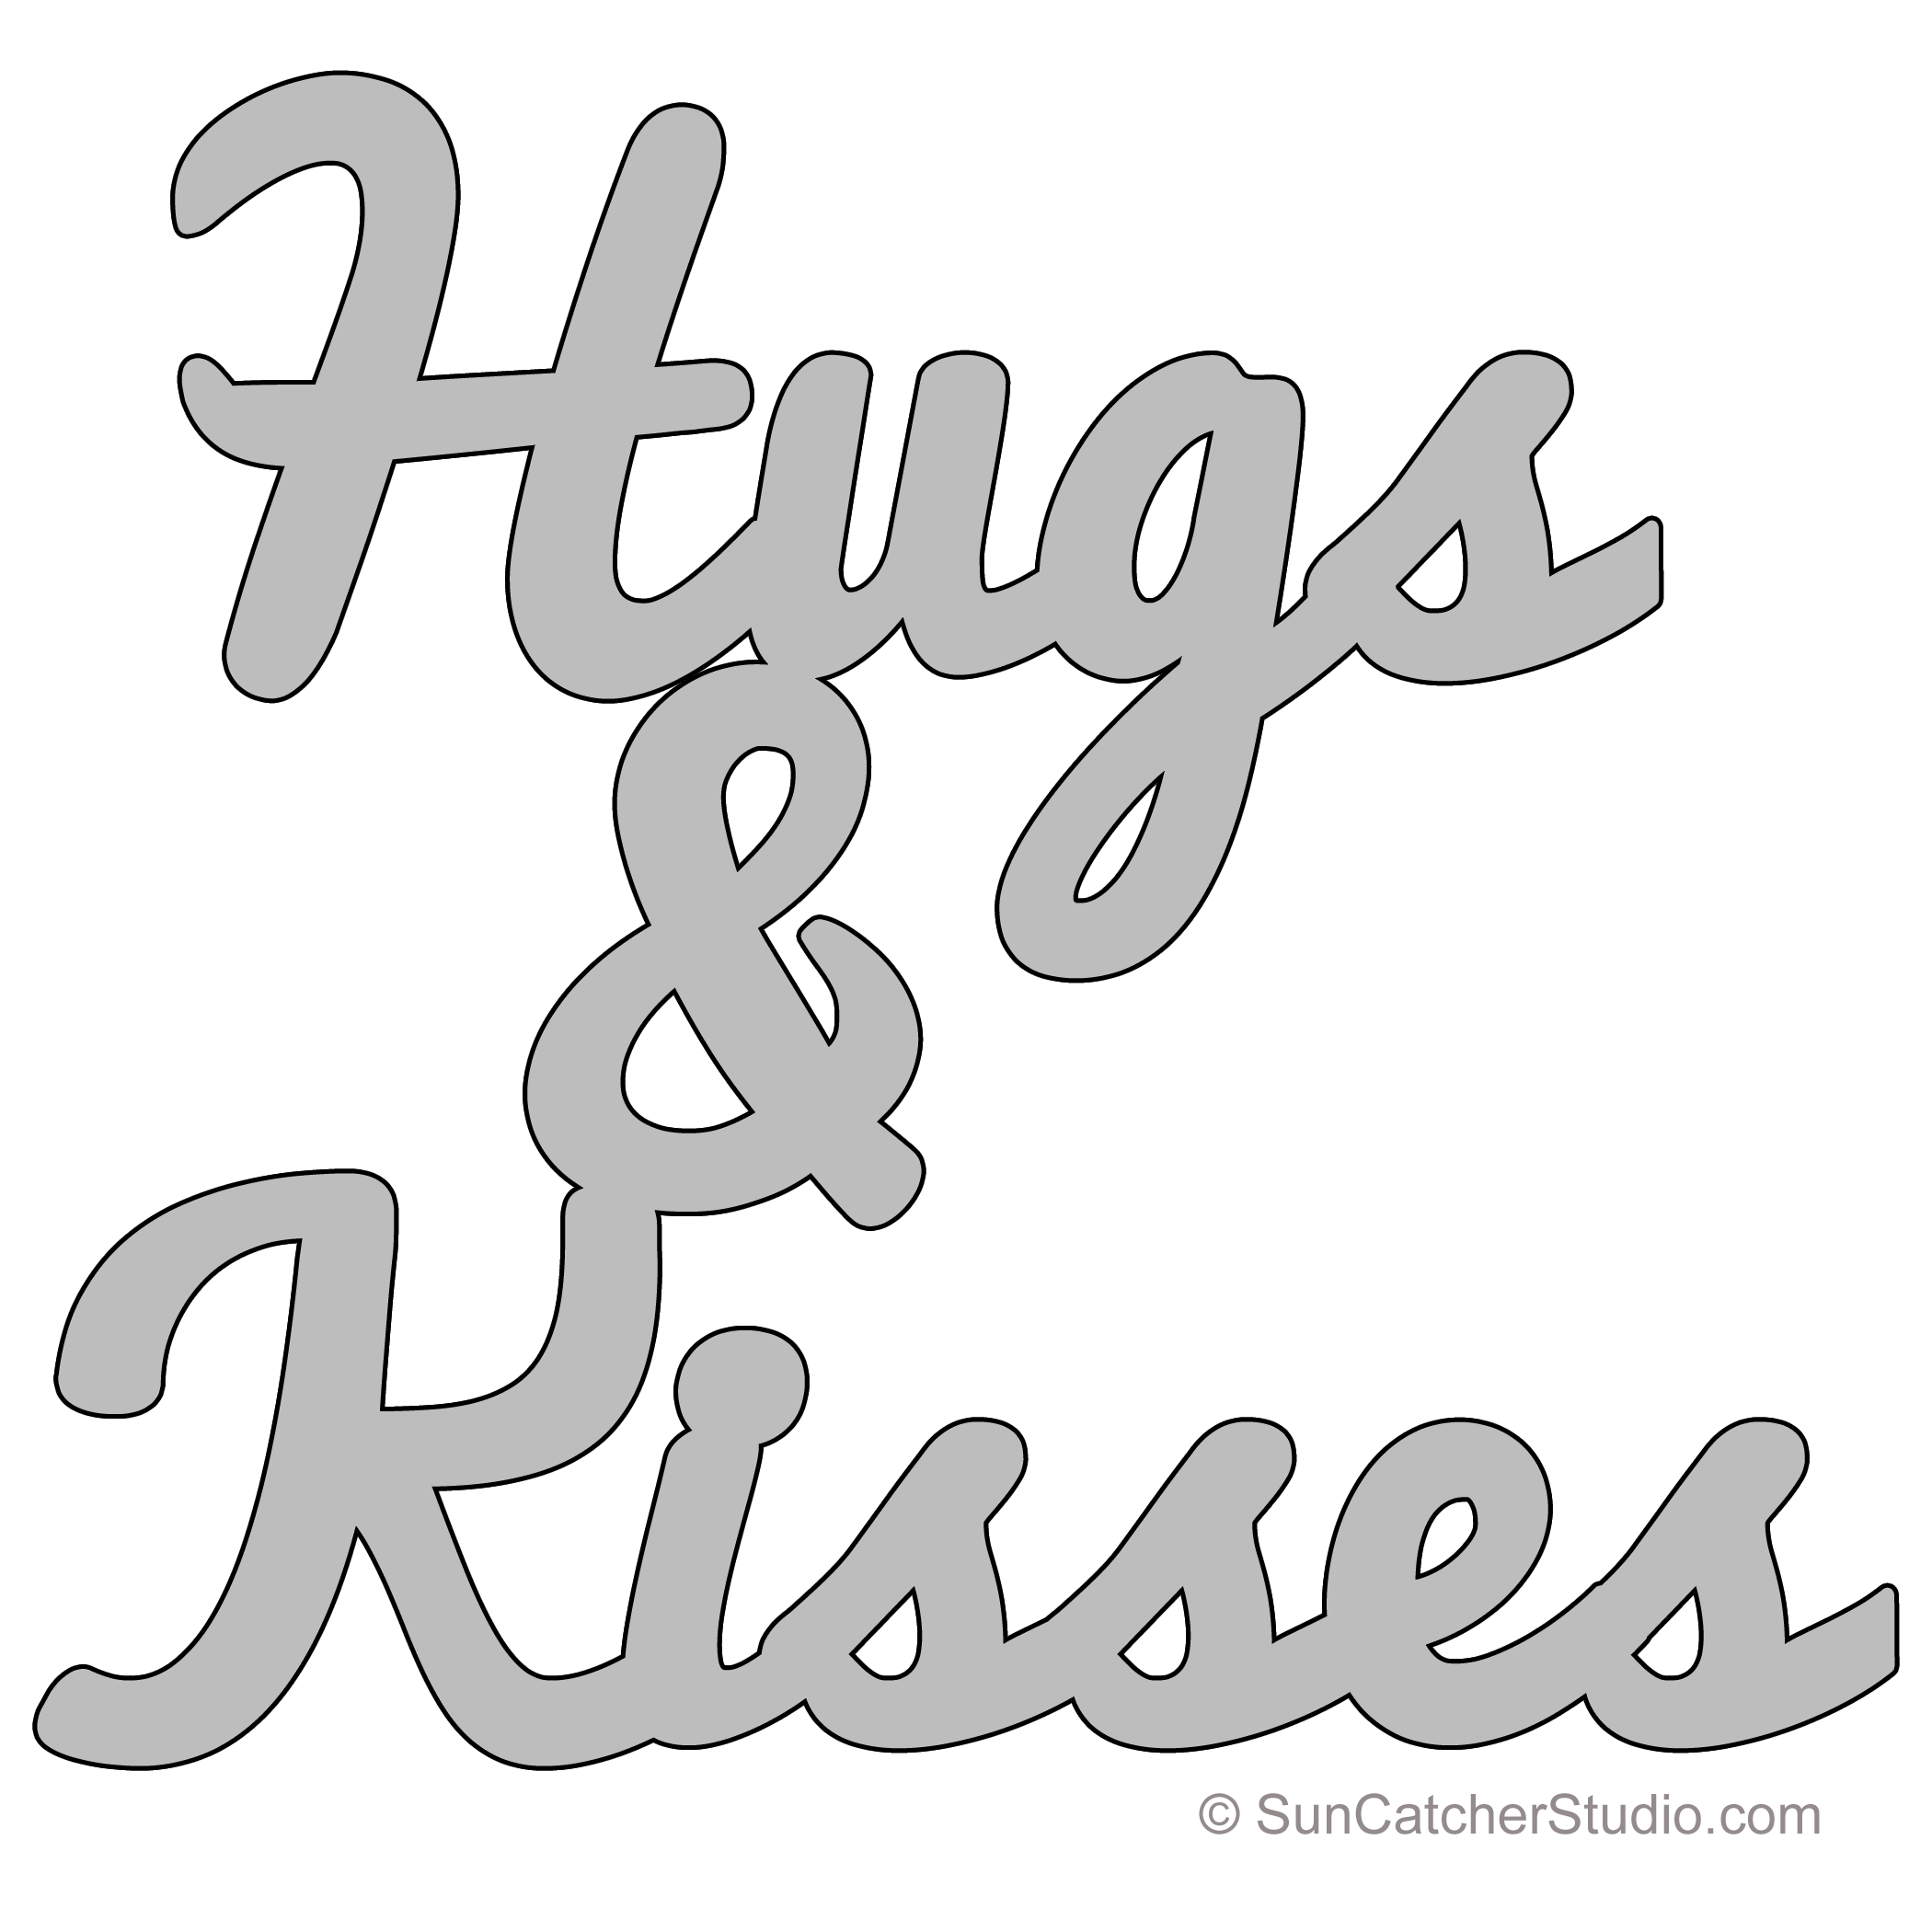 Hugs Kisses Pattern Template Stencil Printable Word Art Design Stencils Printables Templates Word Stencils Word Art Design